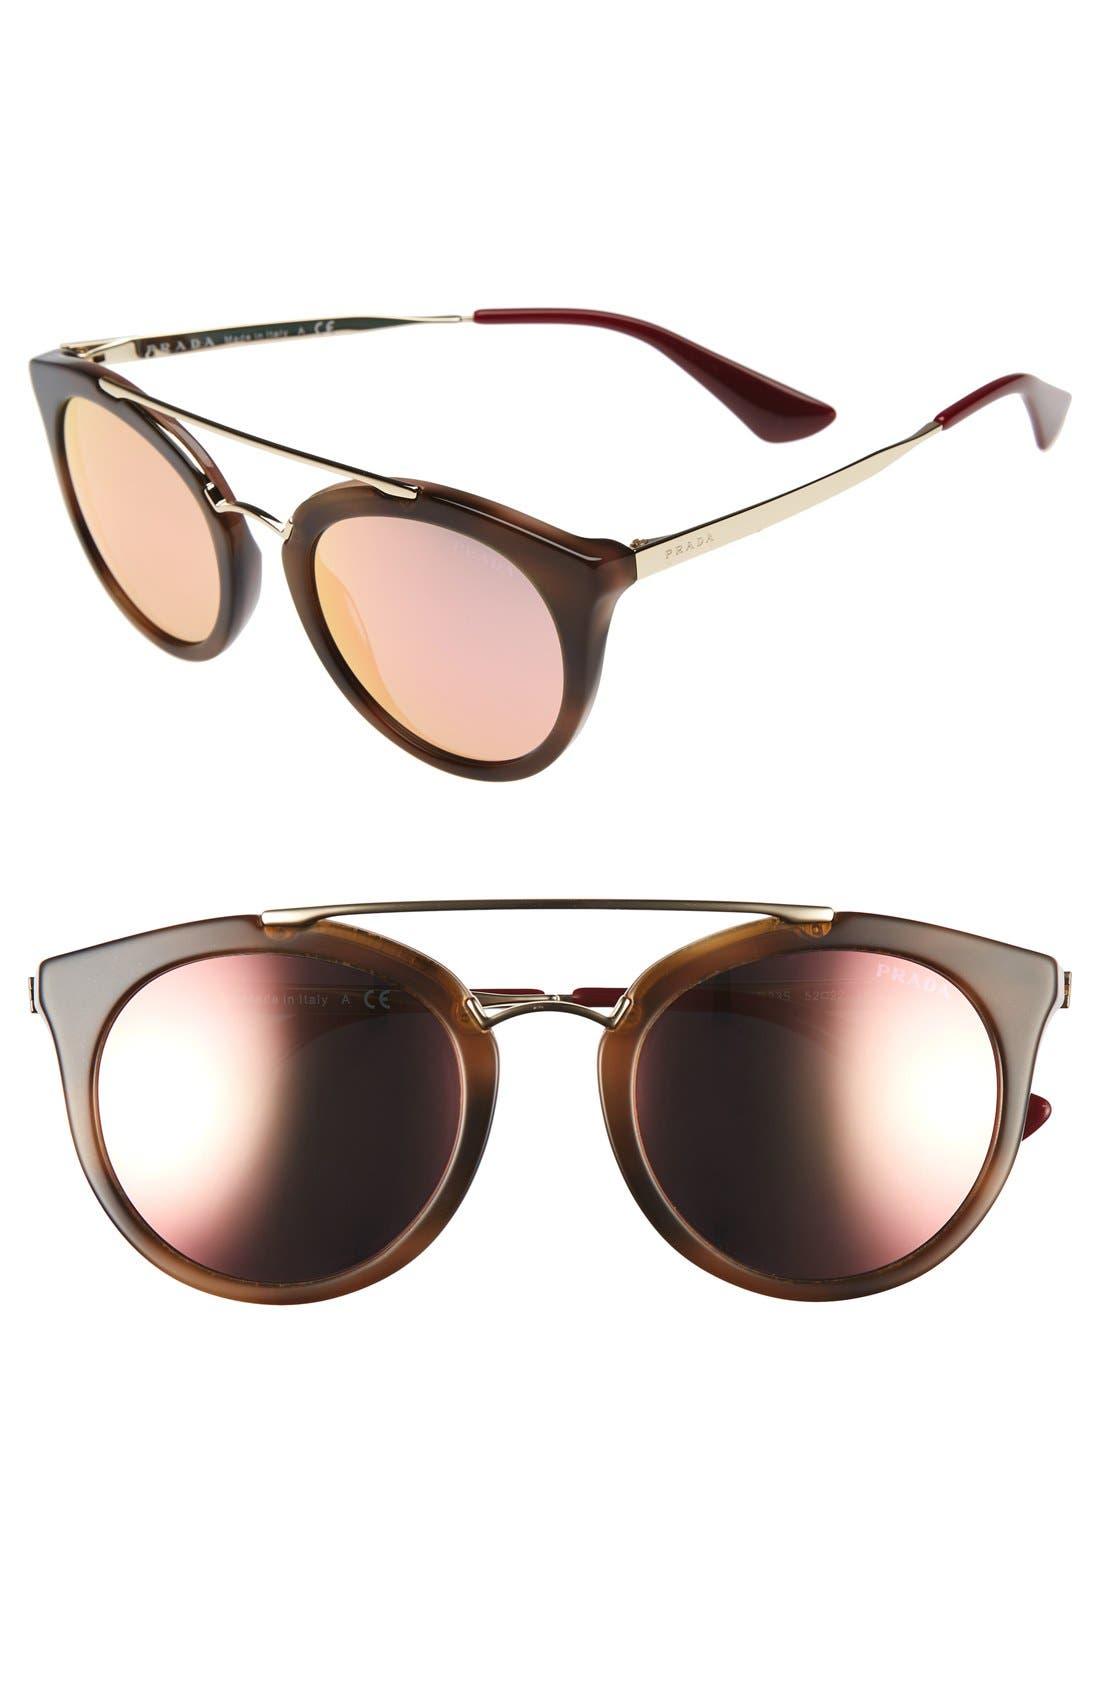 brow-bar sunglasses